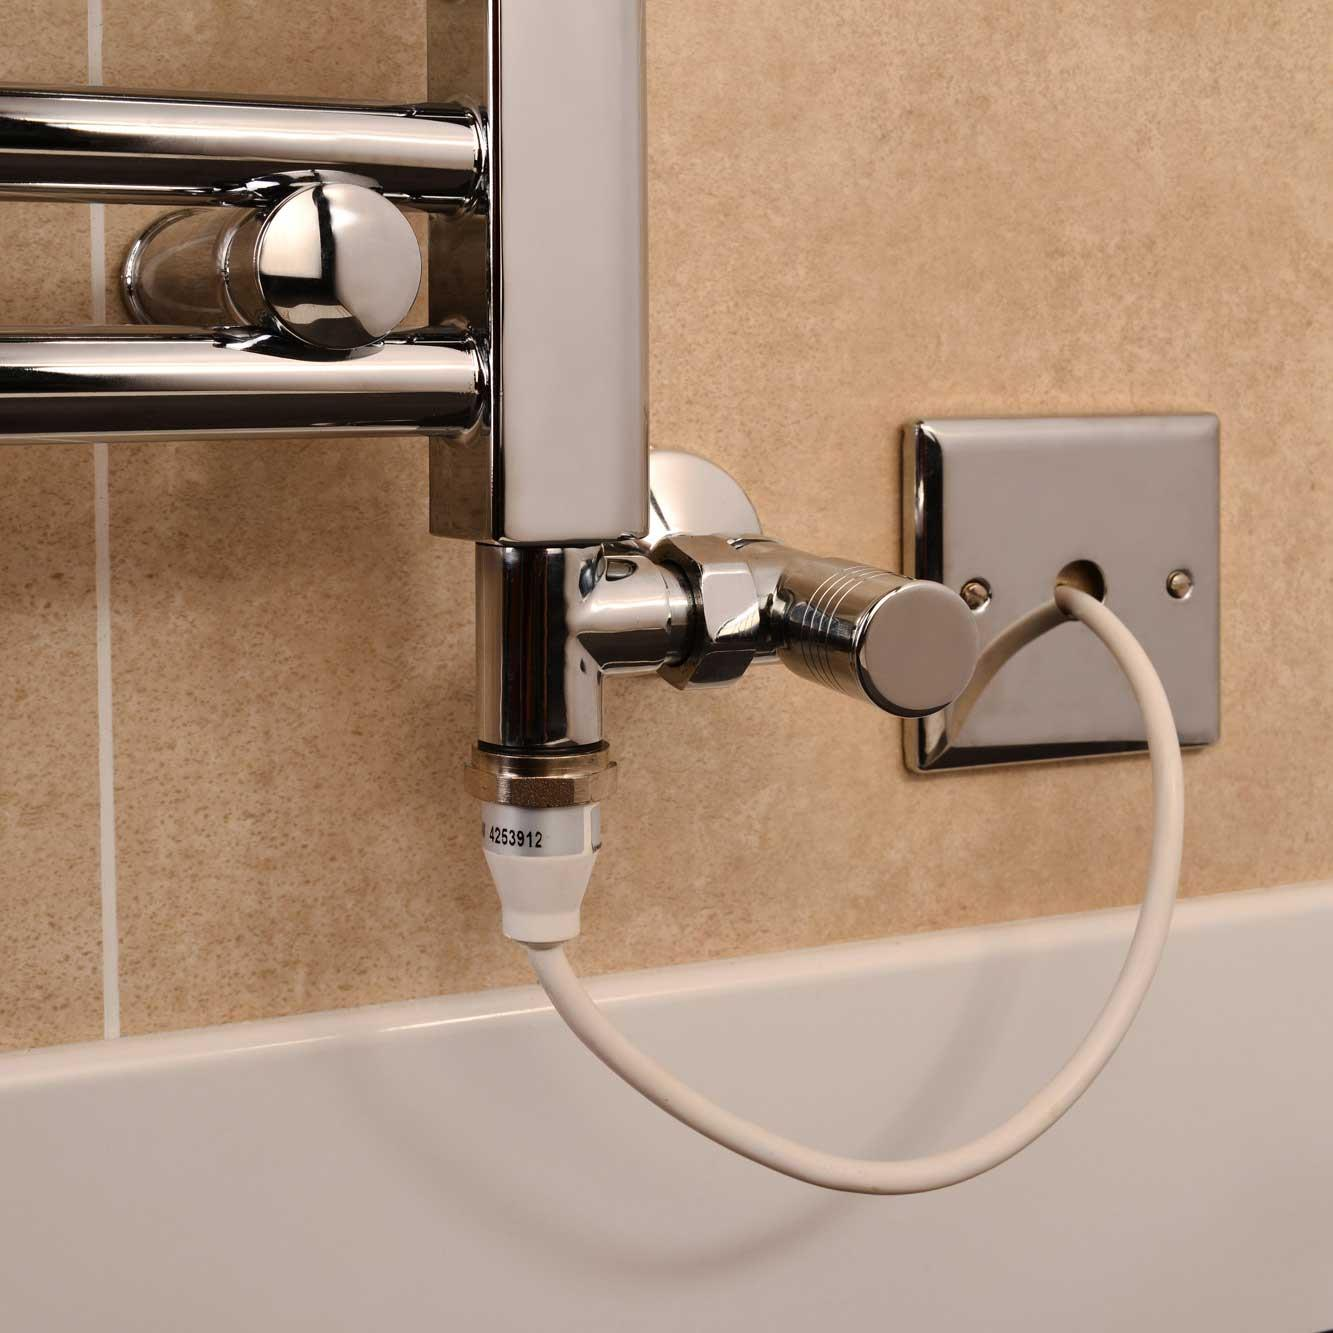 towel rail dual fuel kit 200w ptc element with chrome t. Black Bedroom Furniture Sets. Home Design Ideas